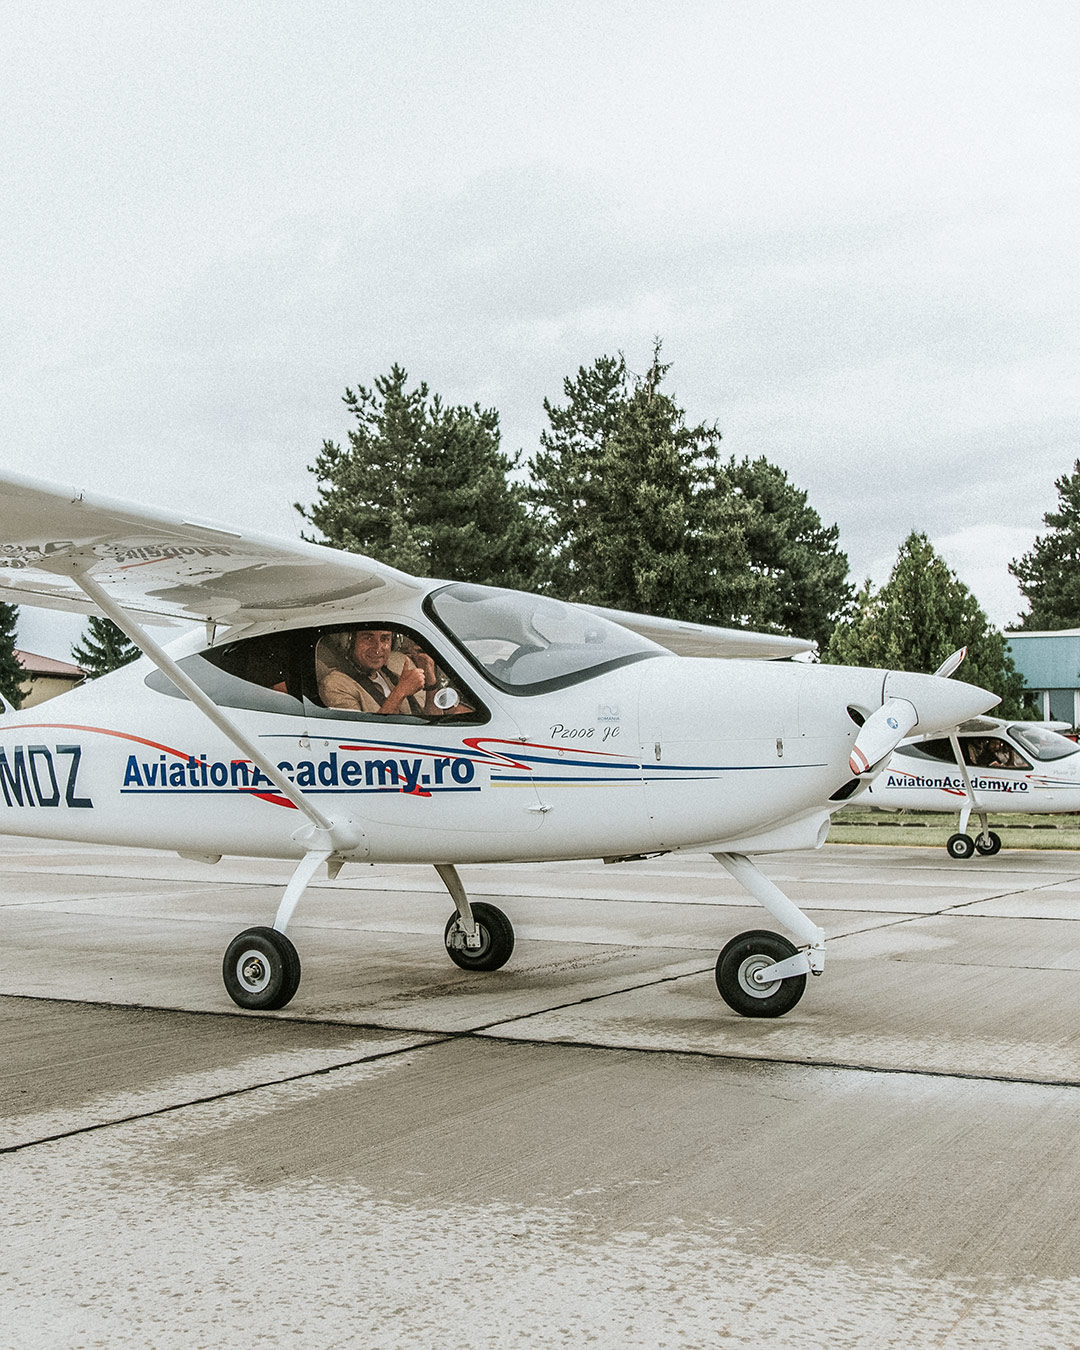 jurca-avion-2